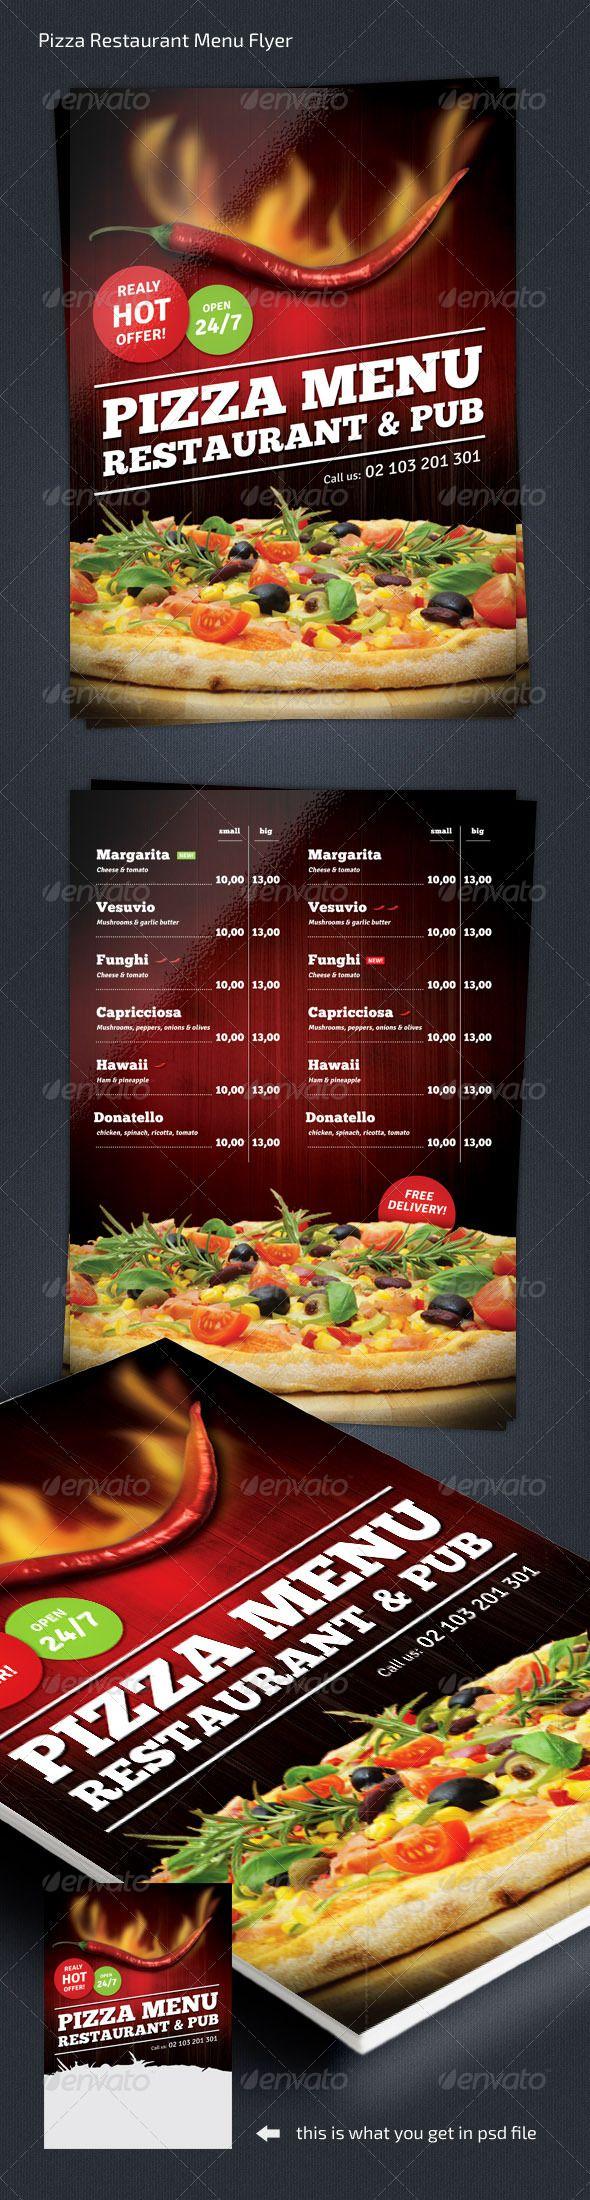 Pizza Restaurant Menu Flyer A4